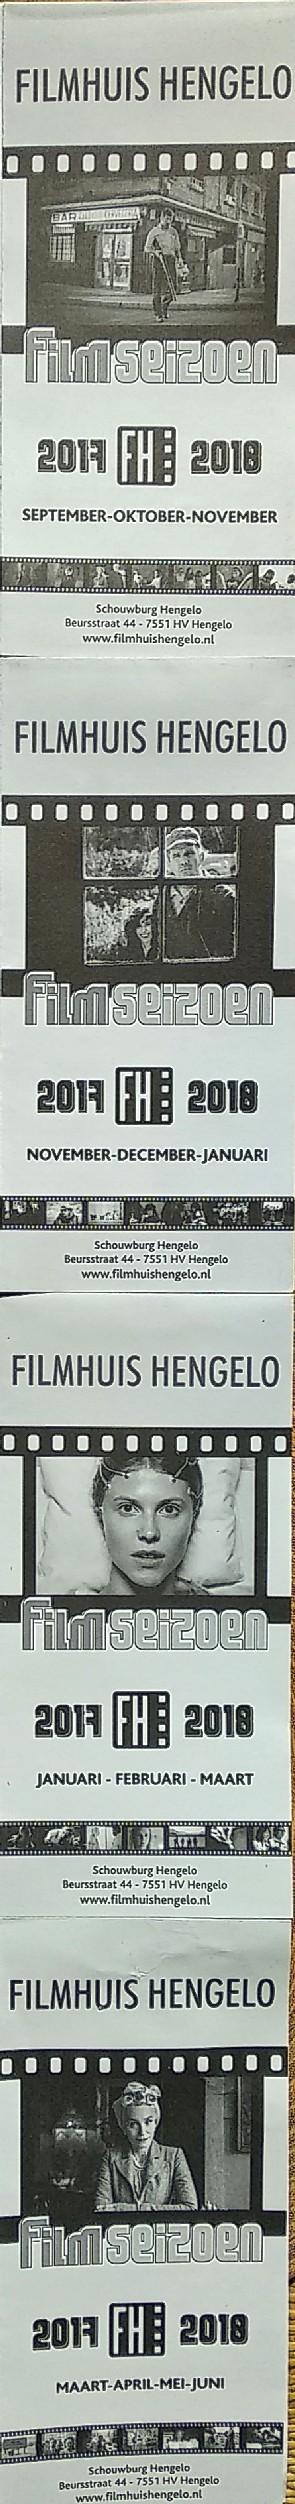 Filmhuis Hengelo Seizoen 2017-2018